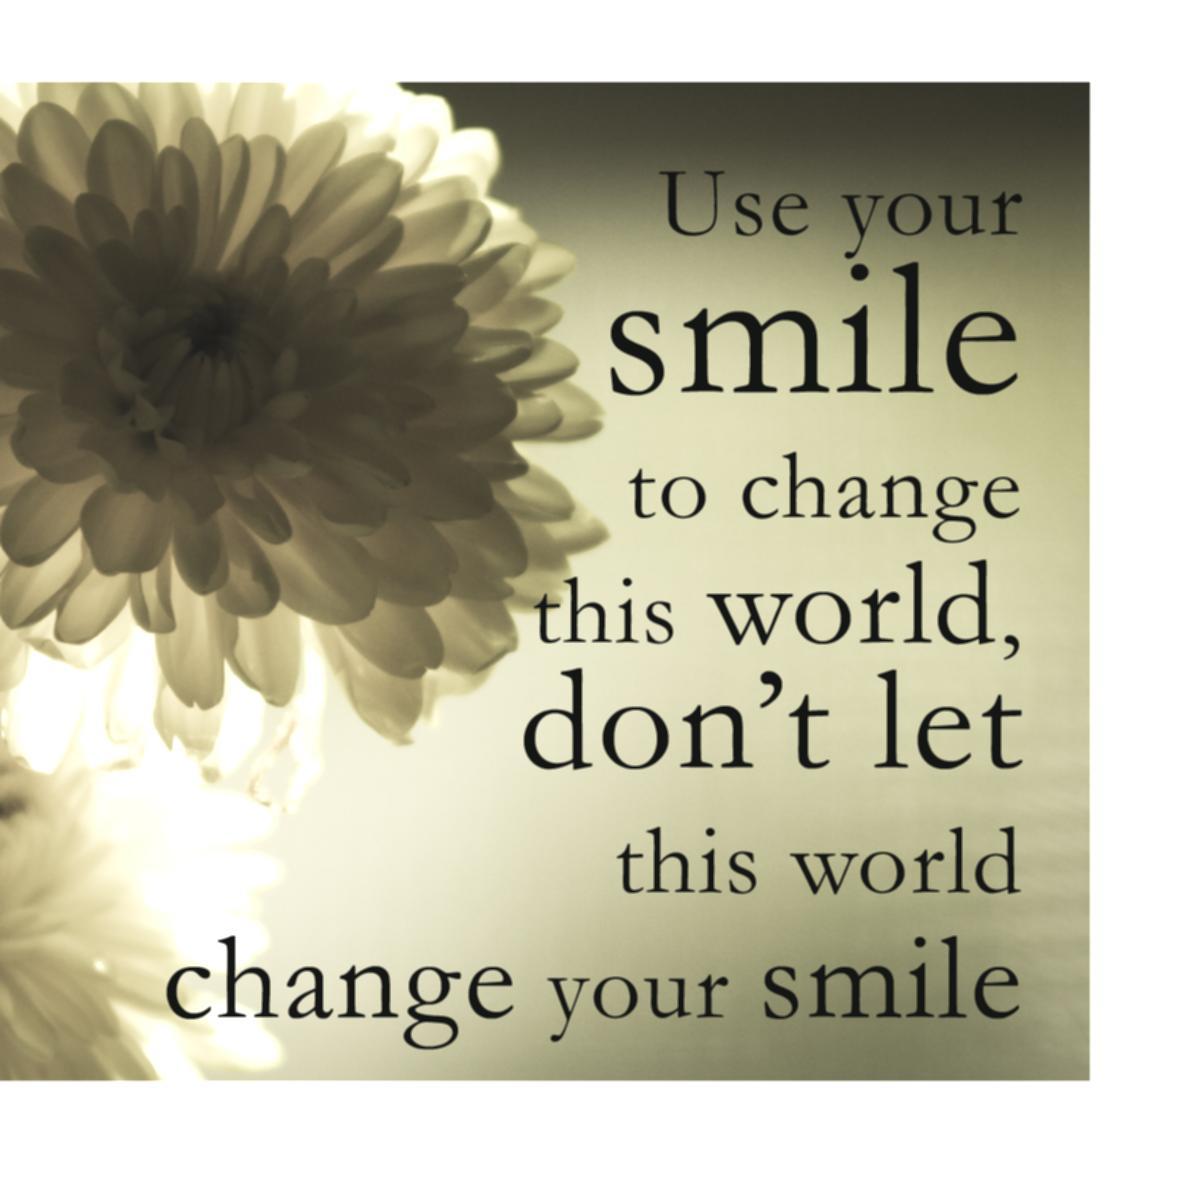 Positive Change Quotes. QuotesGram